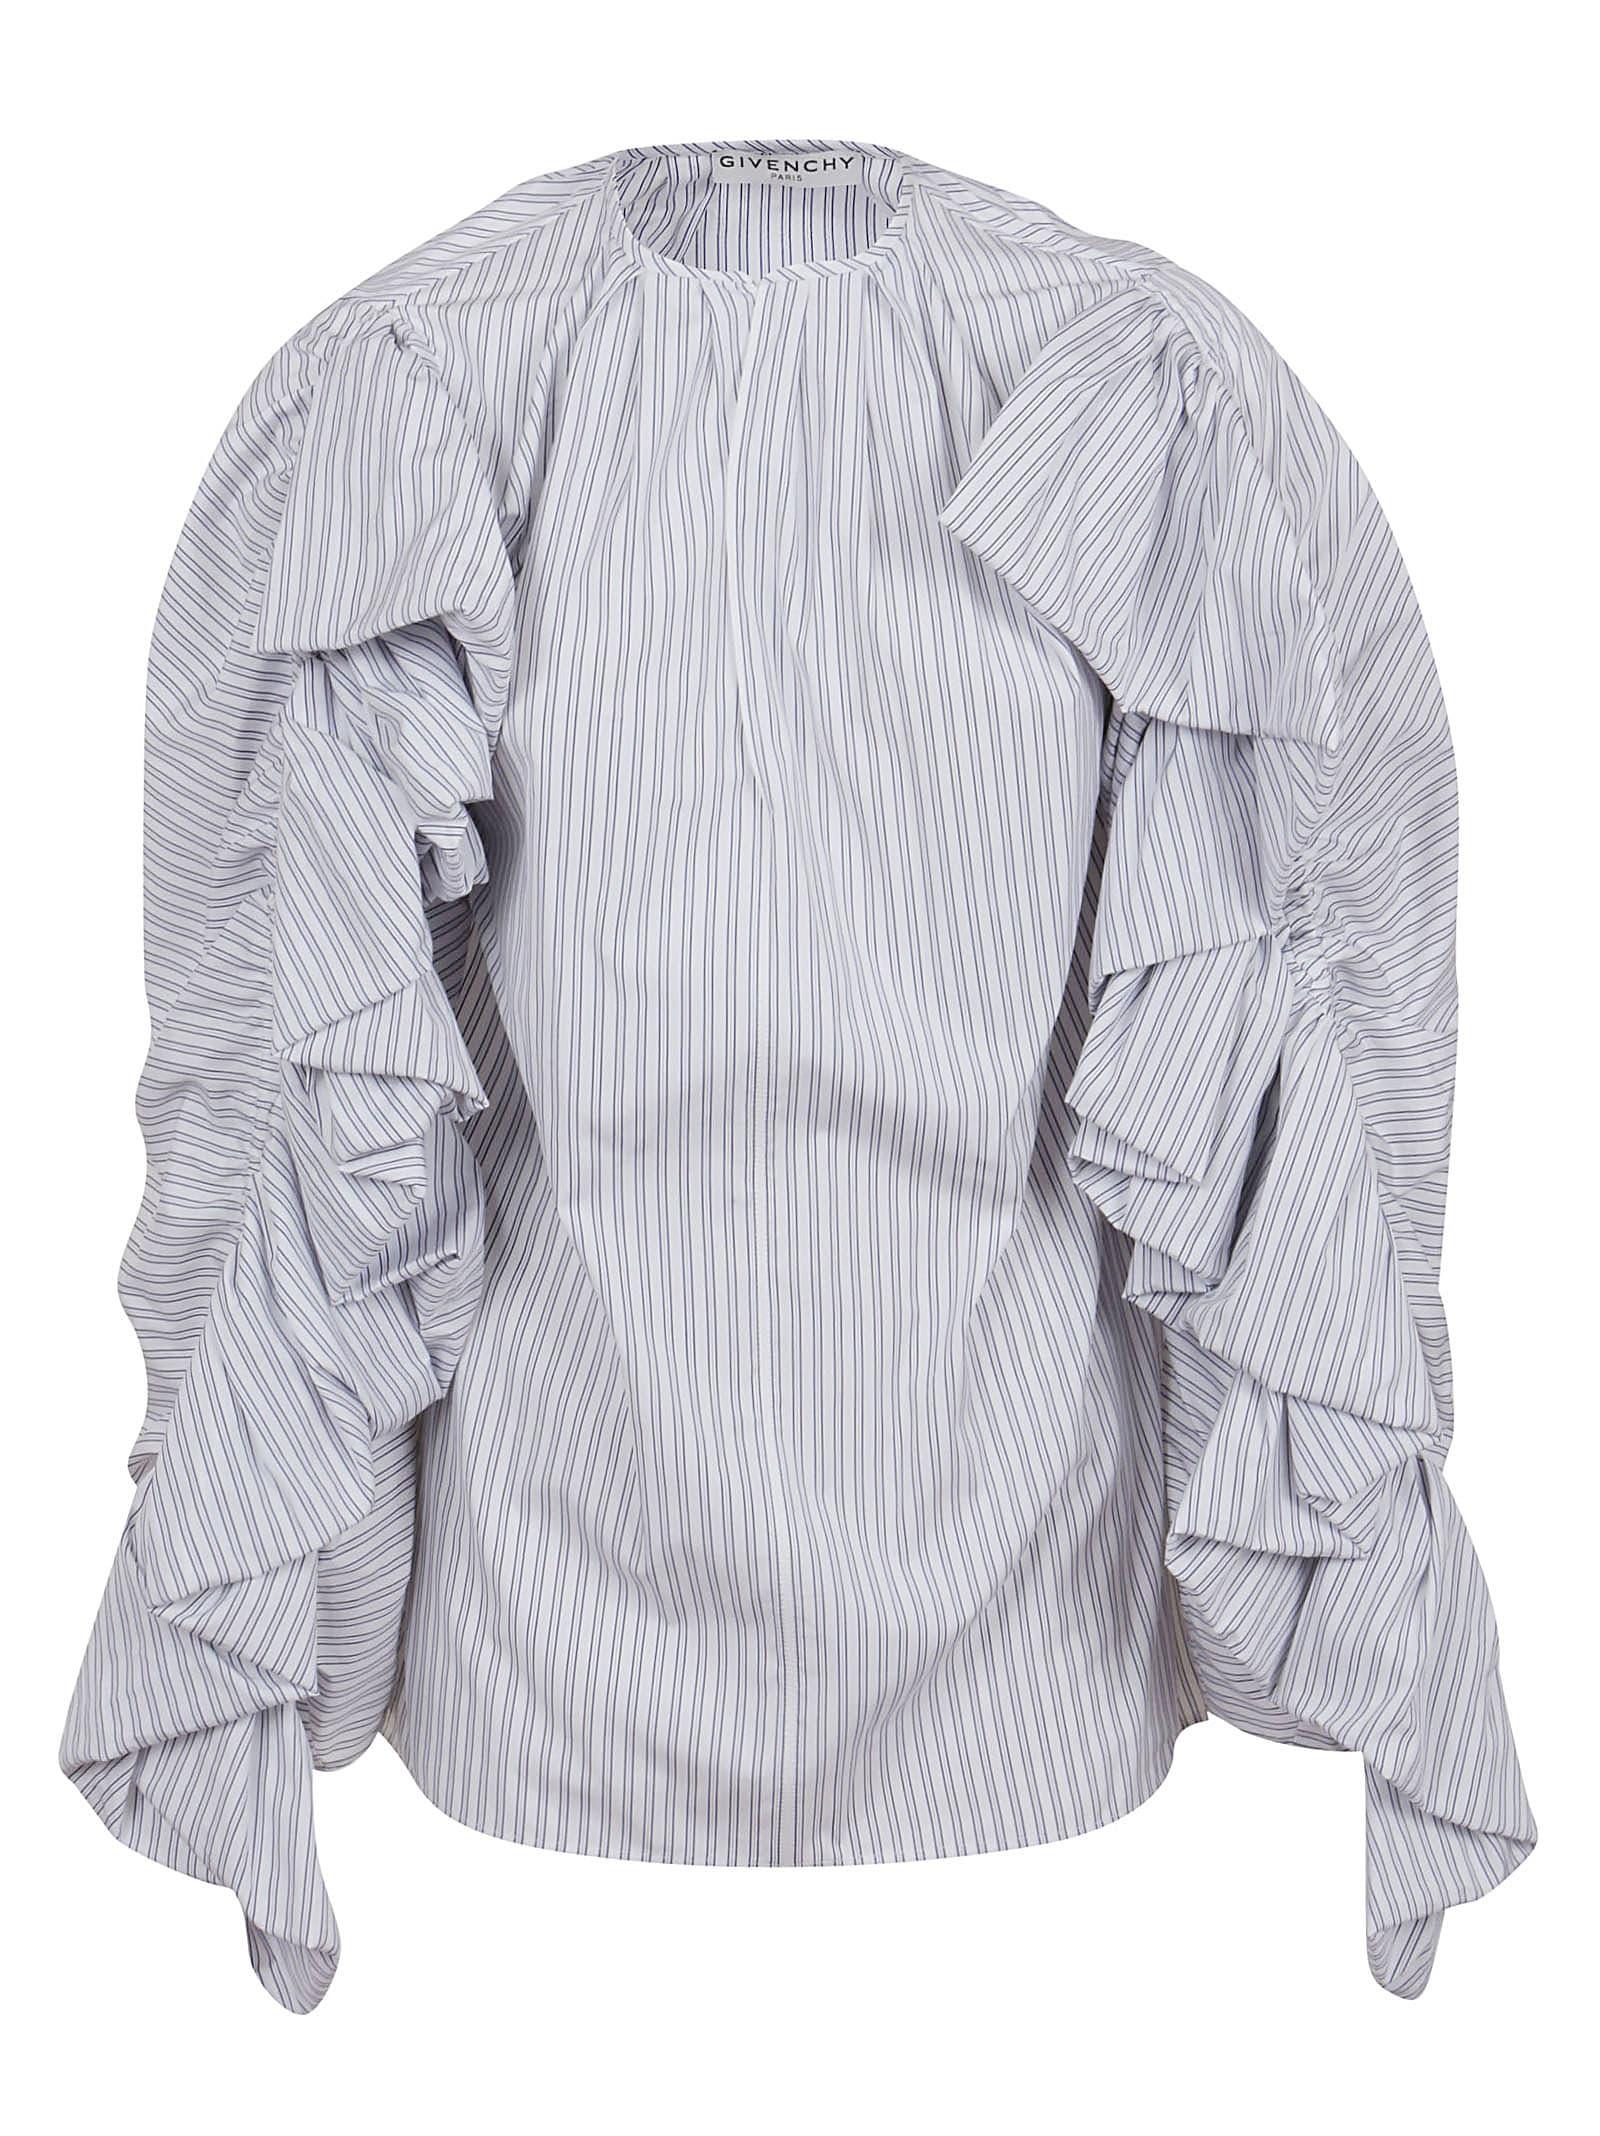 Givenchy Shirt With Ruffled Sleeves